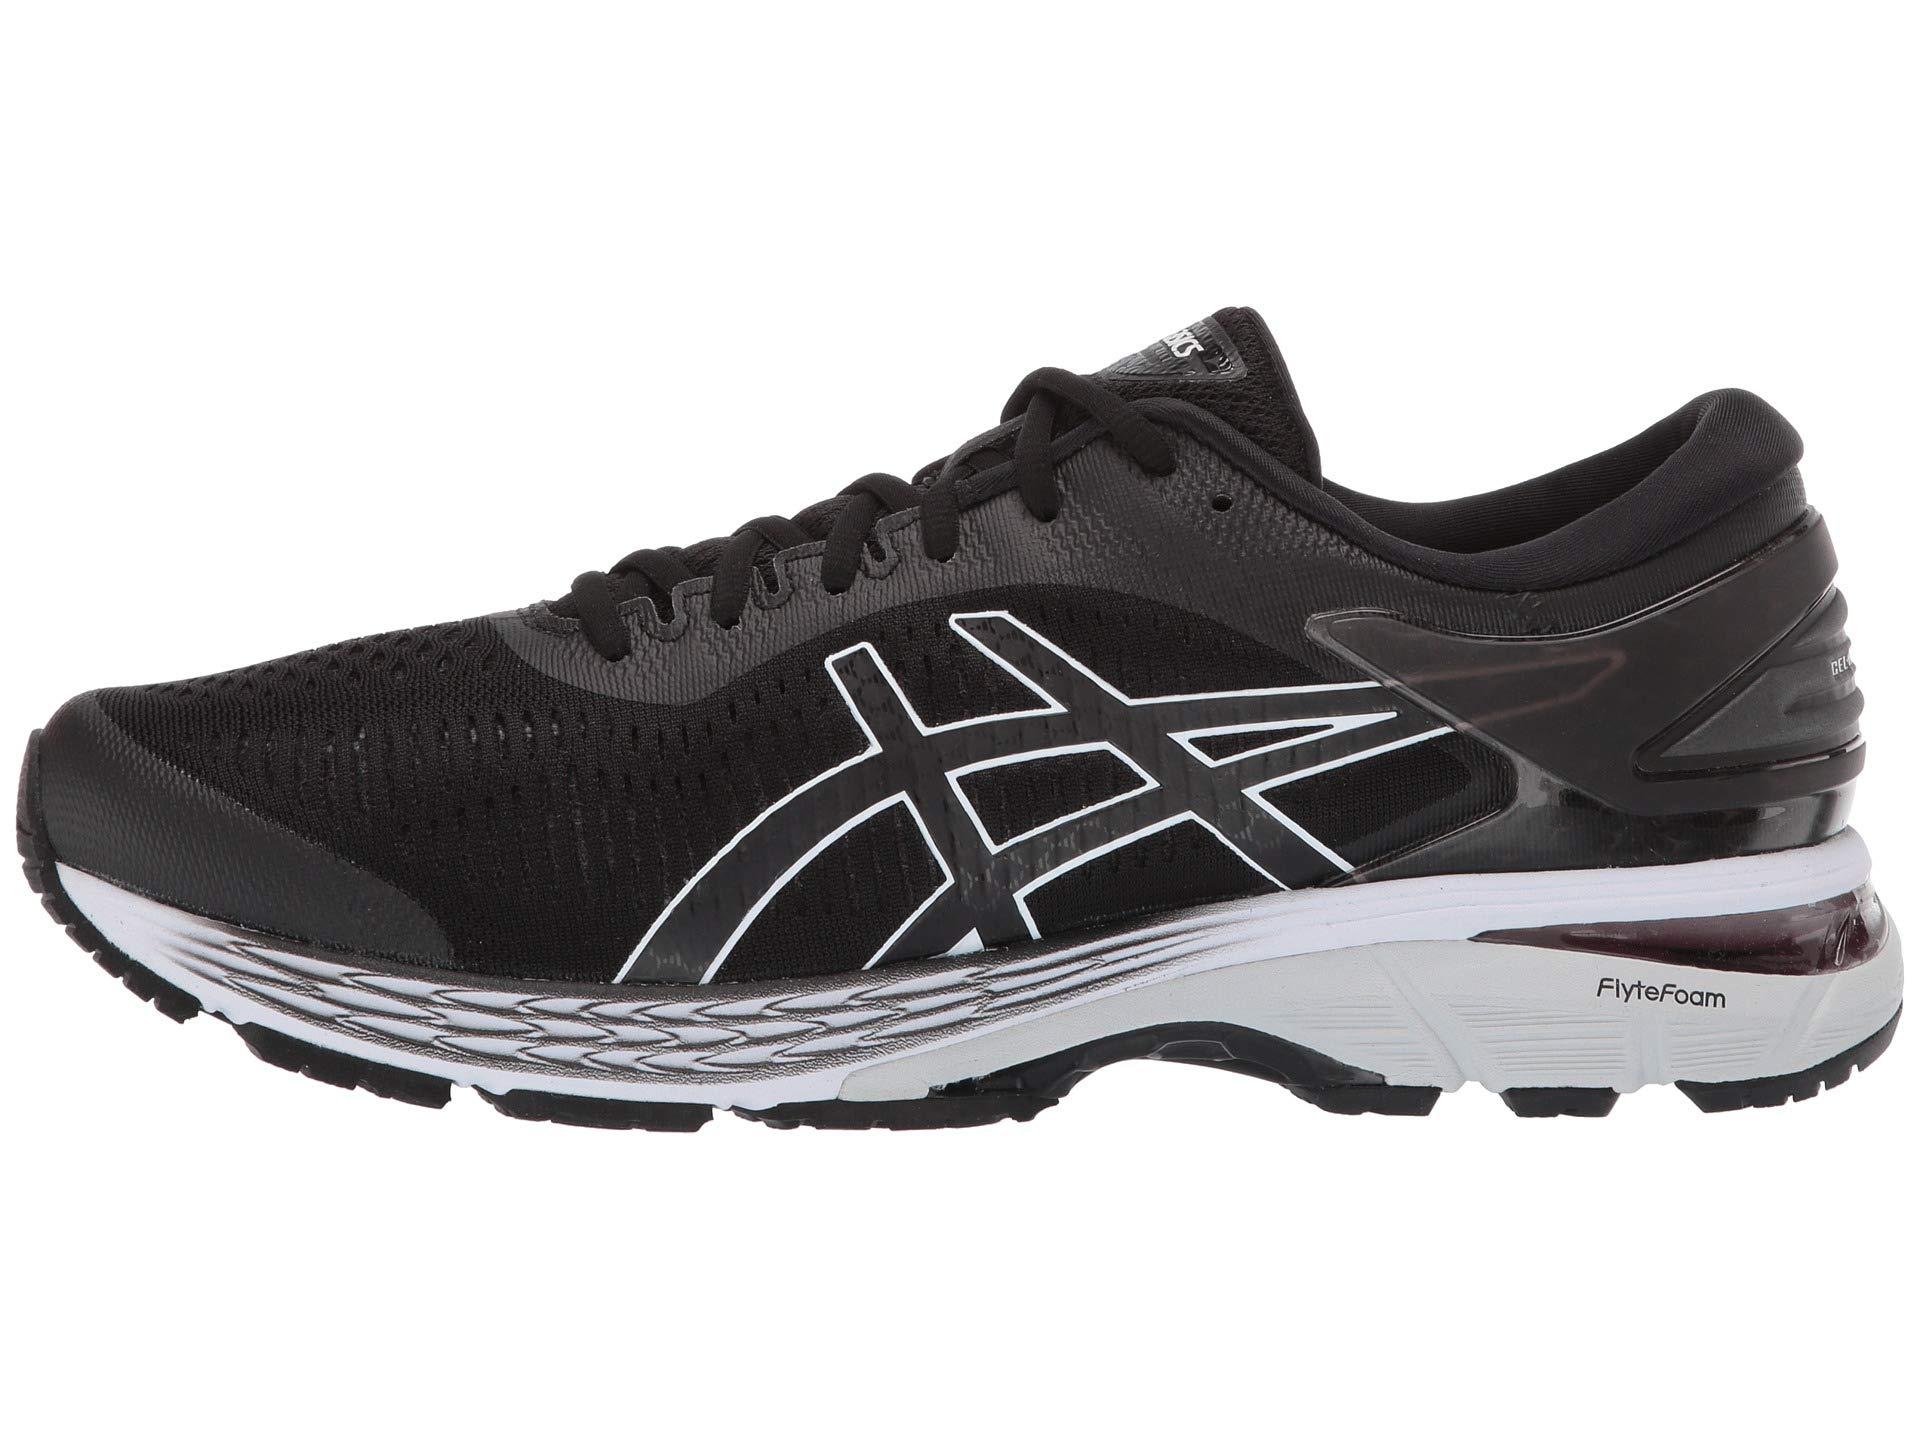 ASICS Gel Kayano 25 Men's Running Shoe, Black/Glacier Grey, 6.5 D US by ASICS (Image #6)